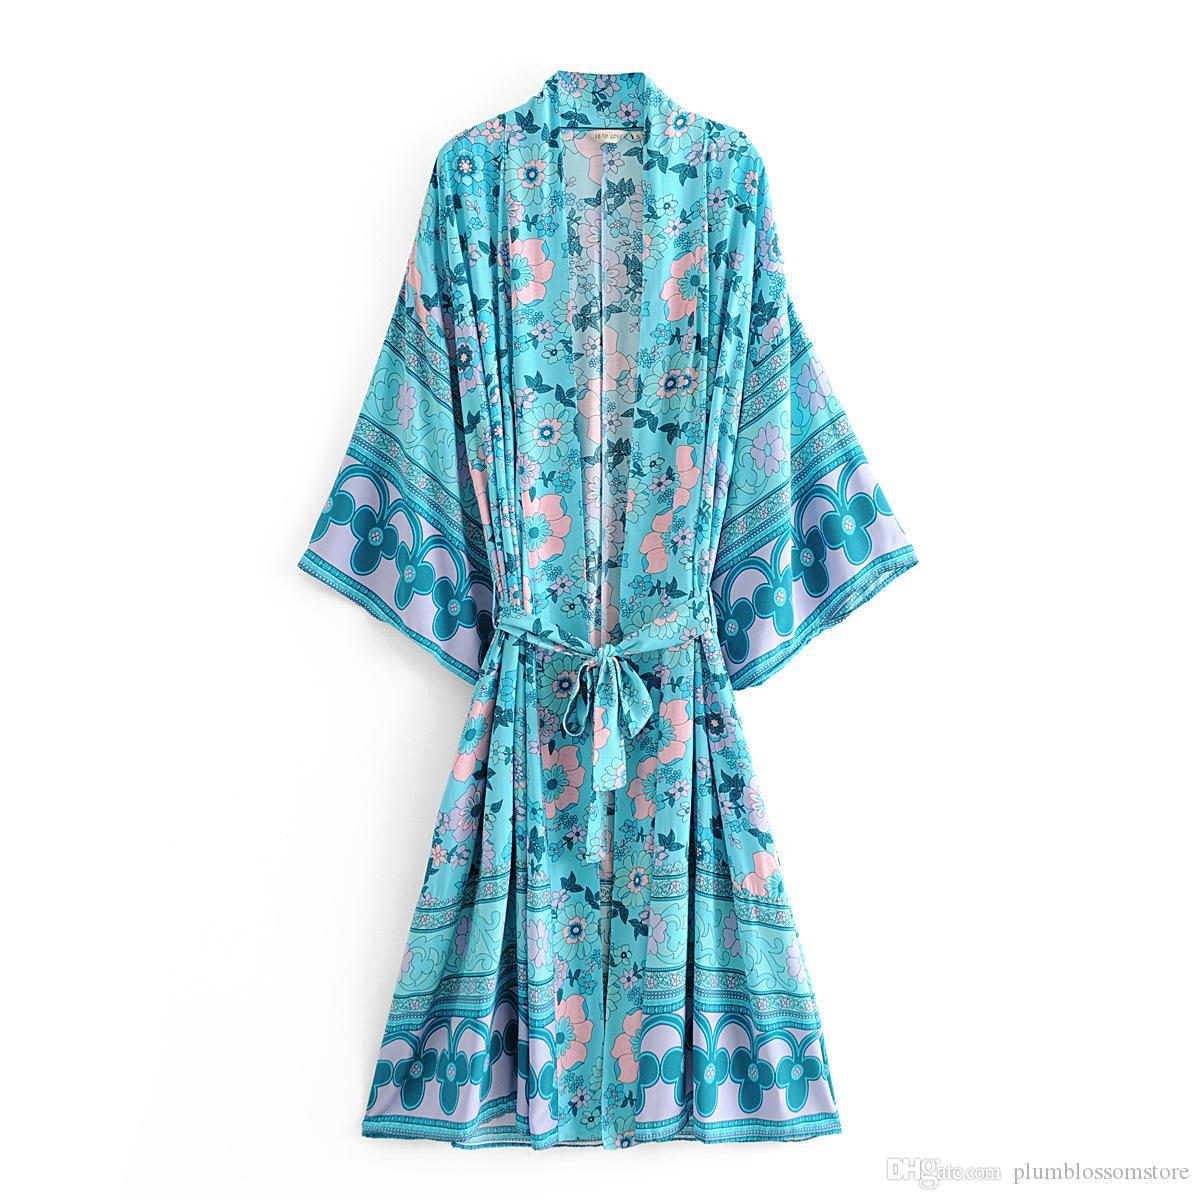 Women Long Robe Kimono Cardigan Blouses Summer Chic Boho Floral Print Fashion Bohemian Sashes Maxi Cardigan Beach Boho Shirt Loose Cover-Ups